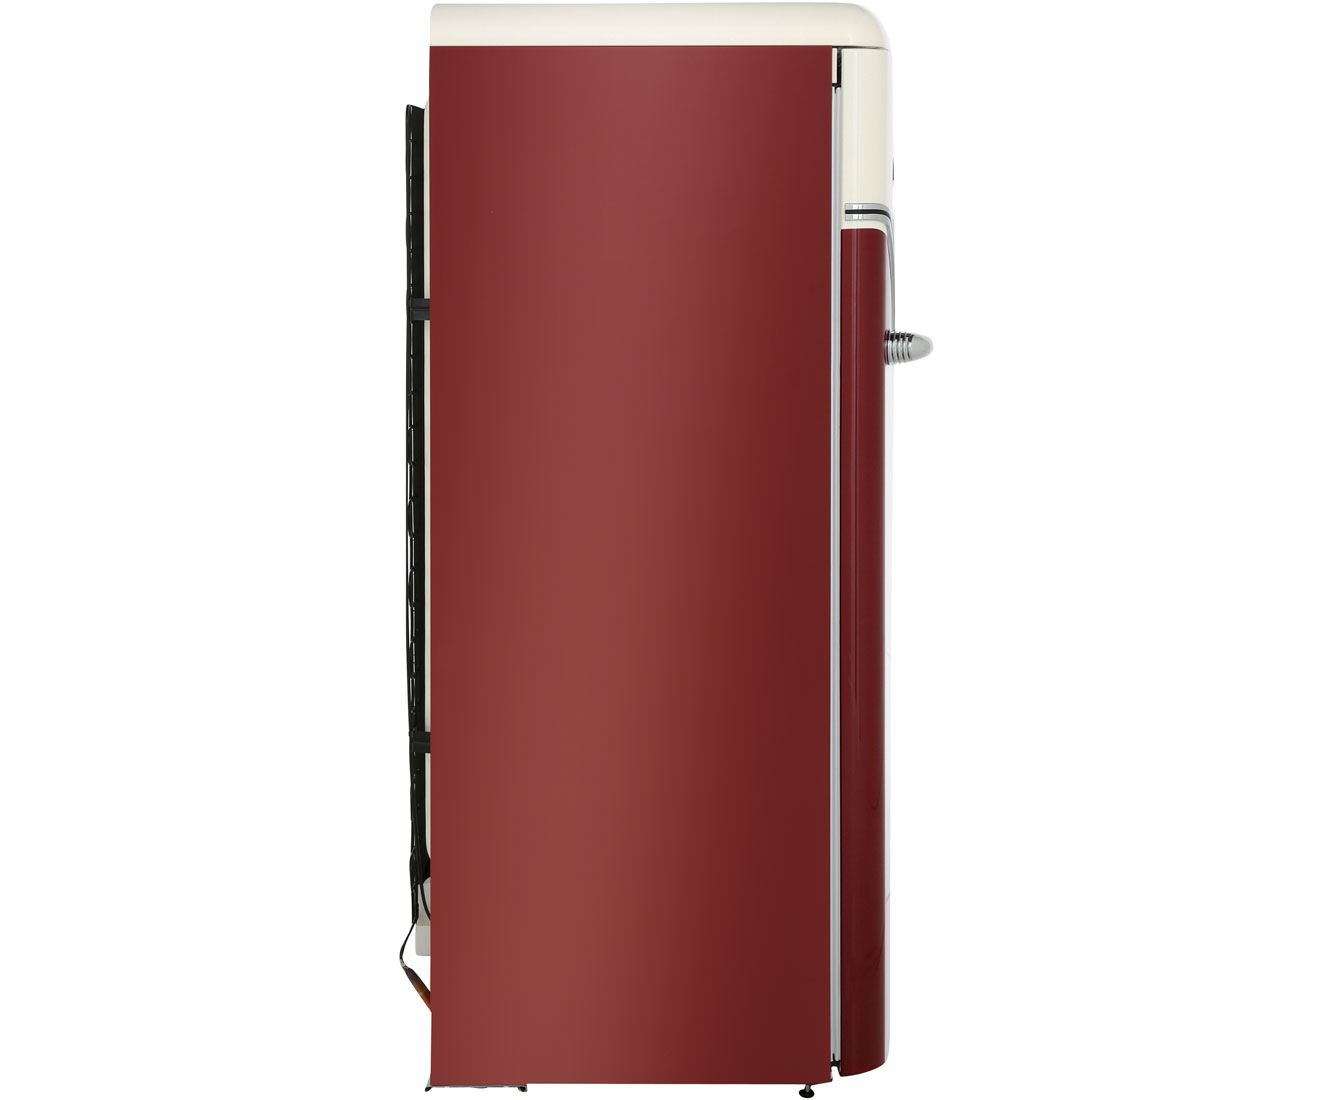 Gorenje Kühlschrank Bulli : Kühlschrank gorenje retro vw design kühlschränke von gorenje